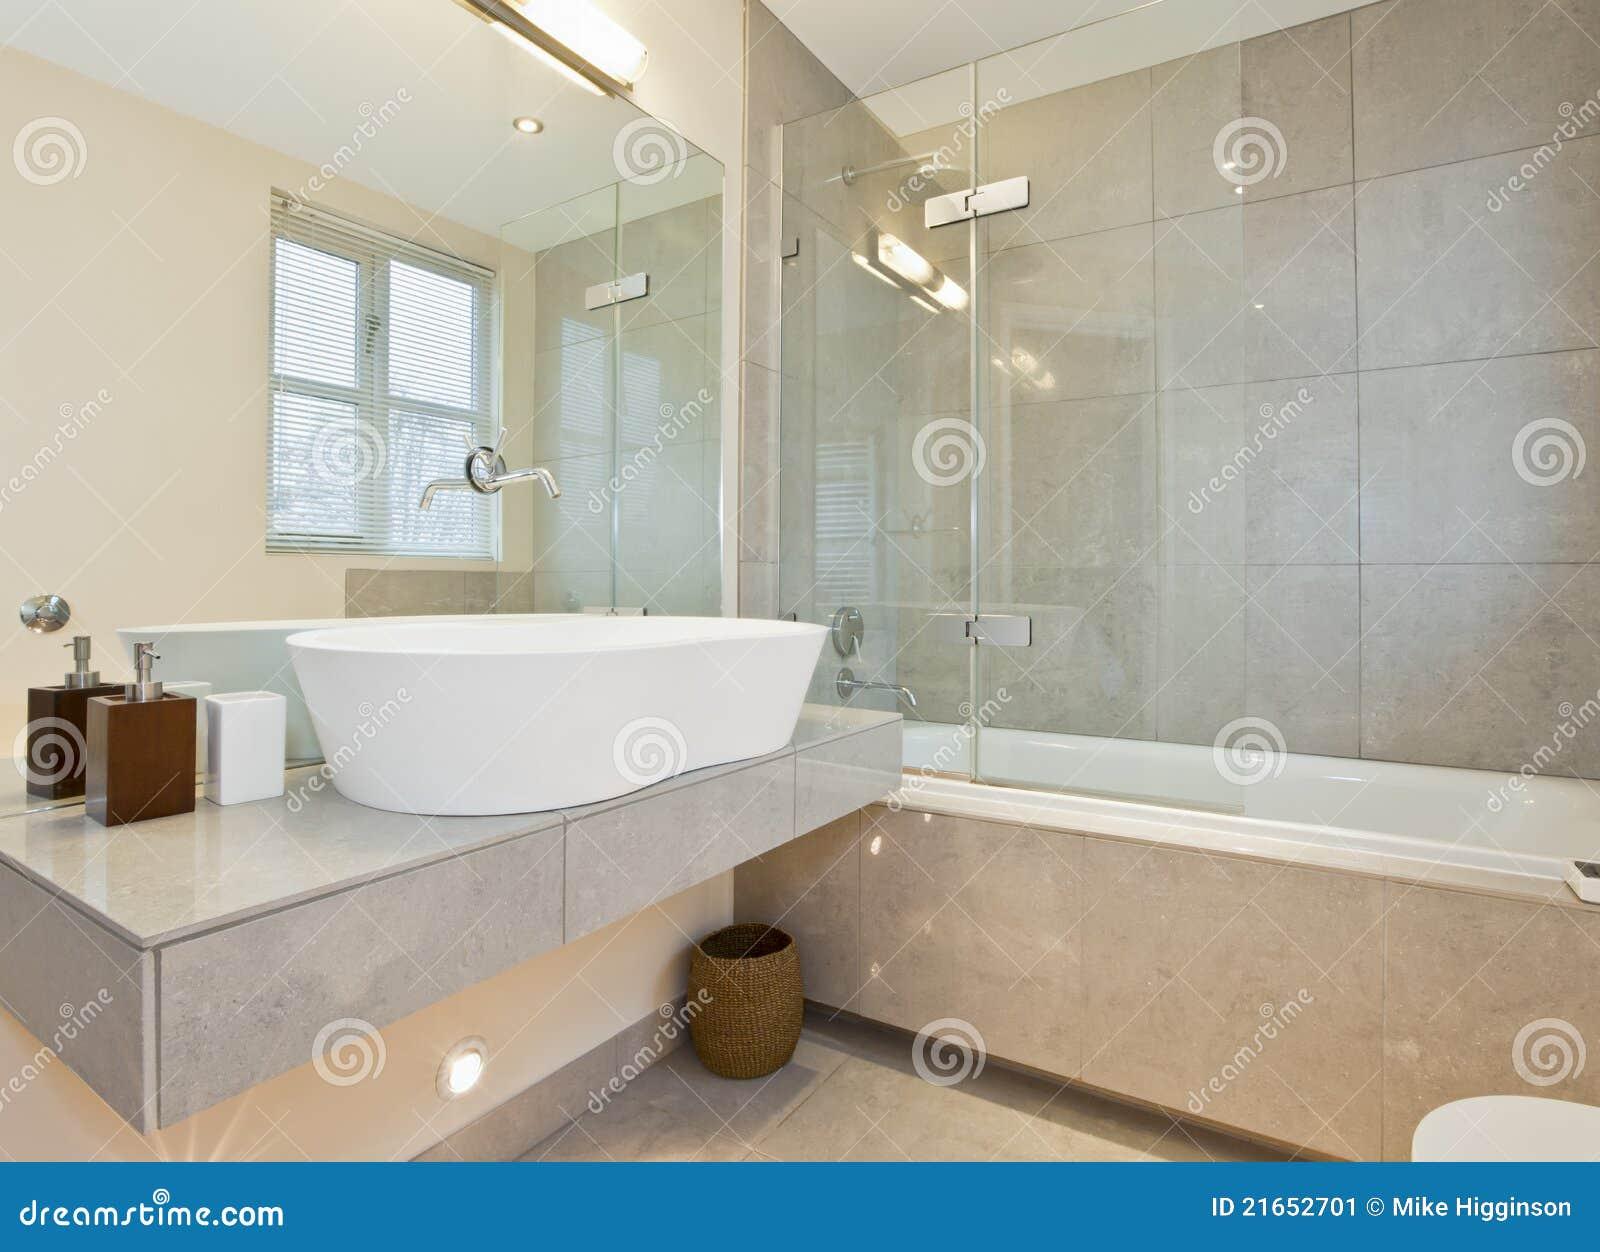 Baños Modernos Marmol:Modern Contemporary Marble Bathroom